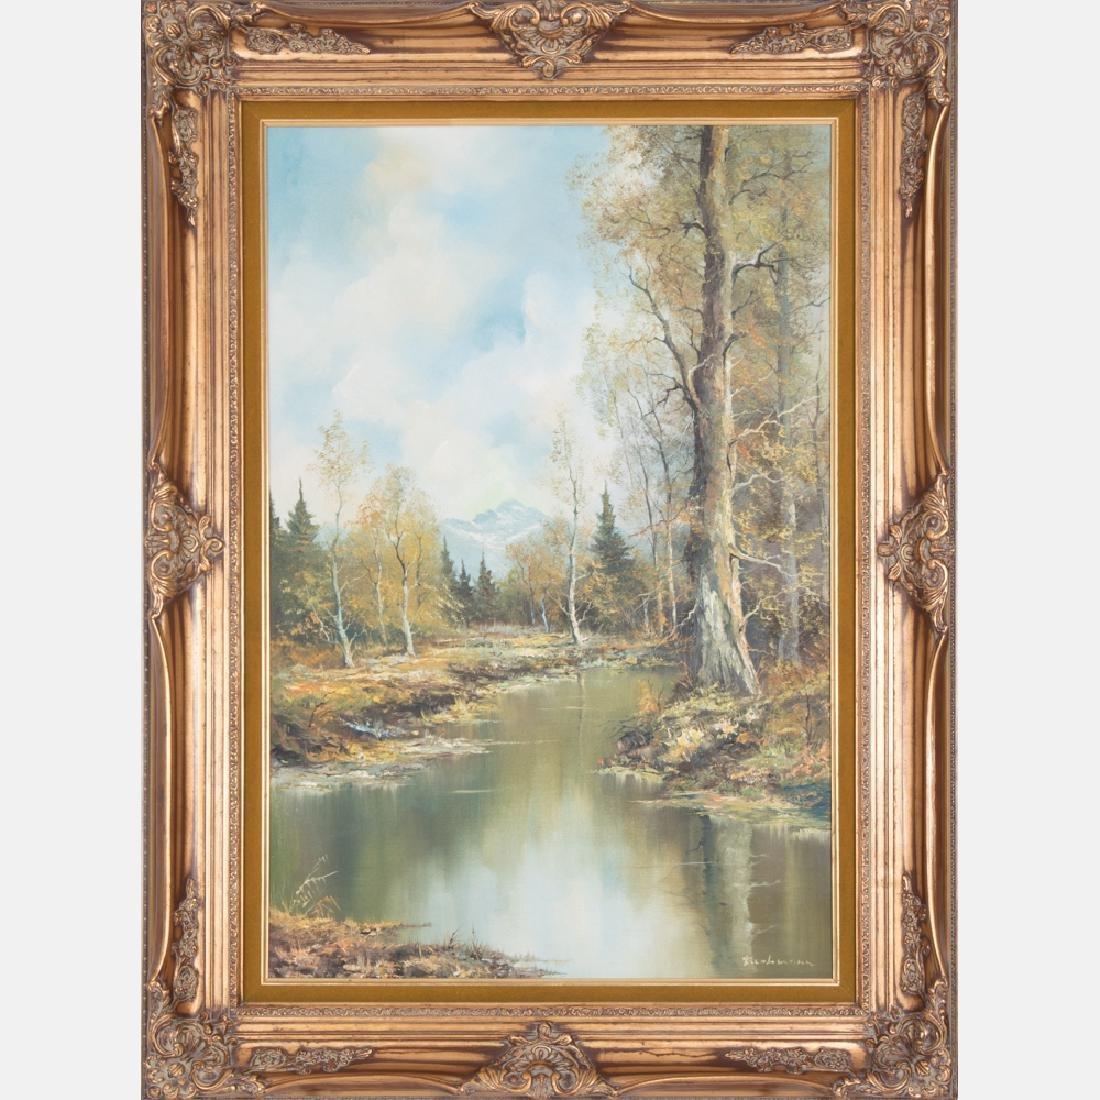 Furhmann (20th Century) Forest Scene, Oil on canvas